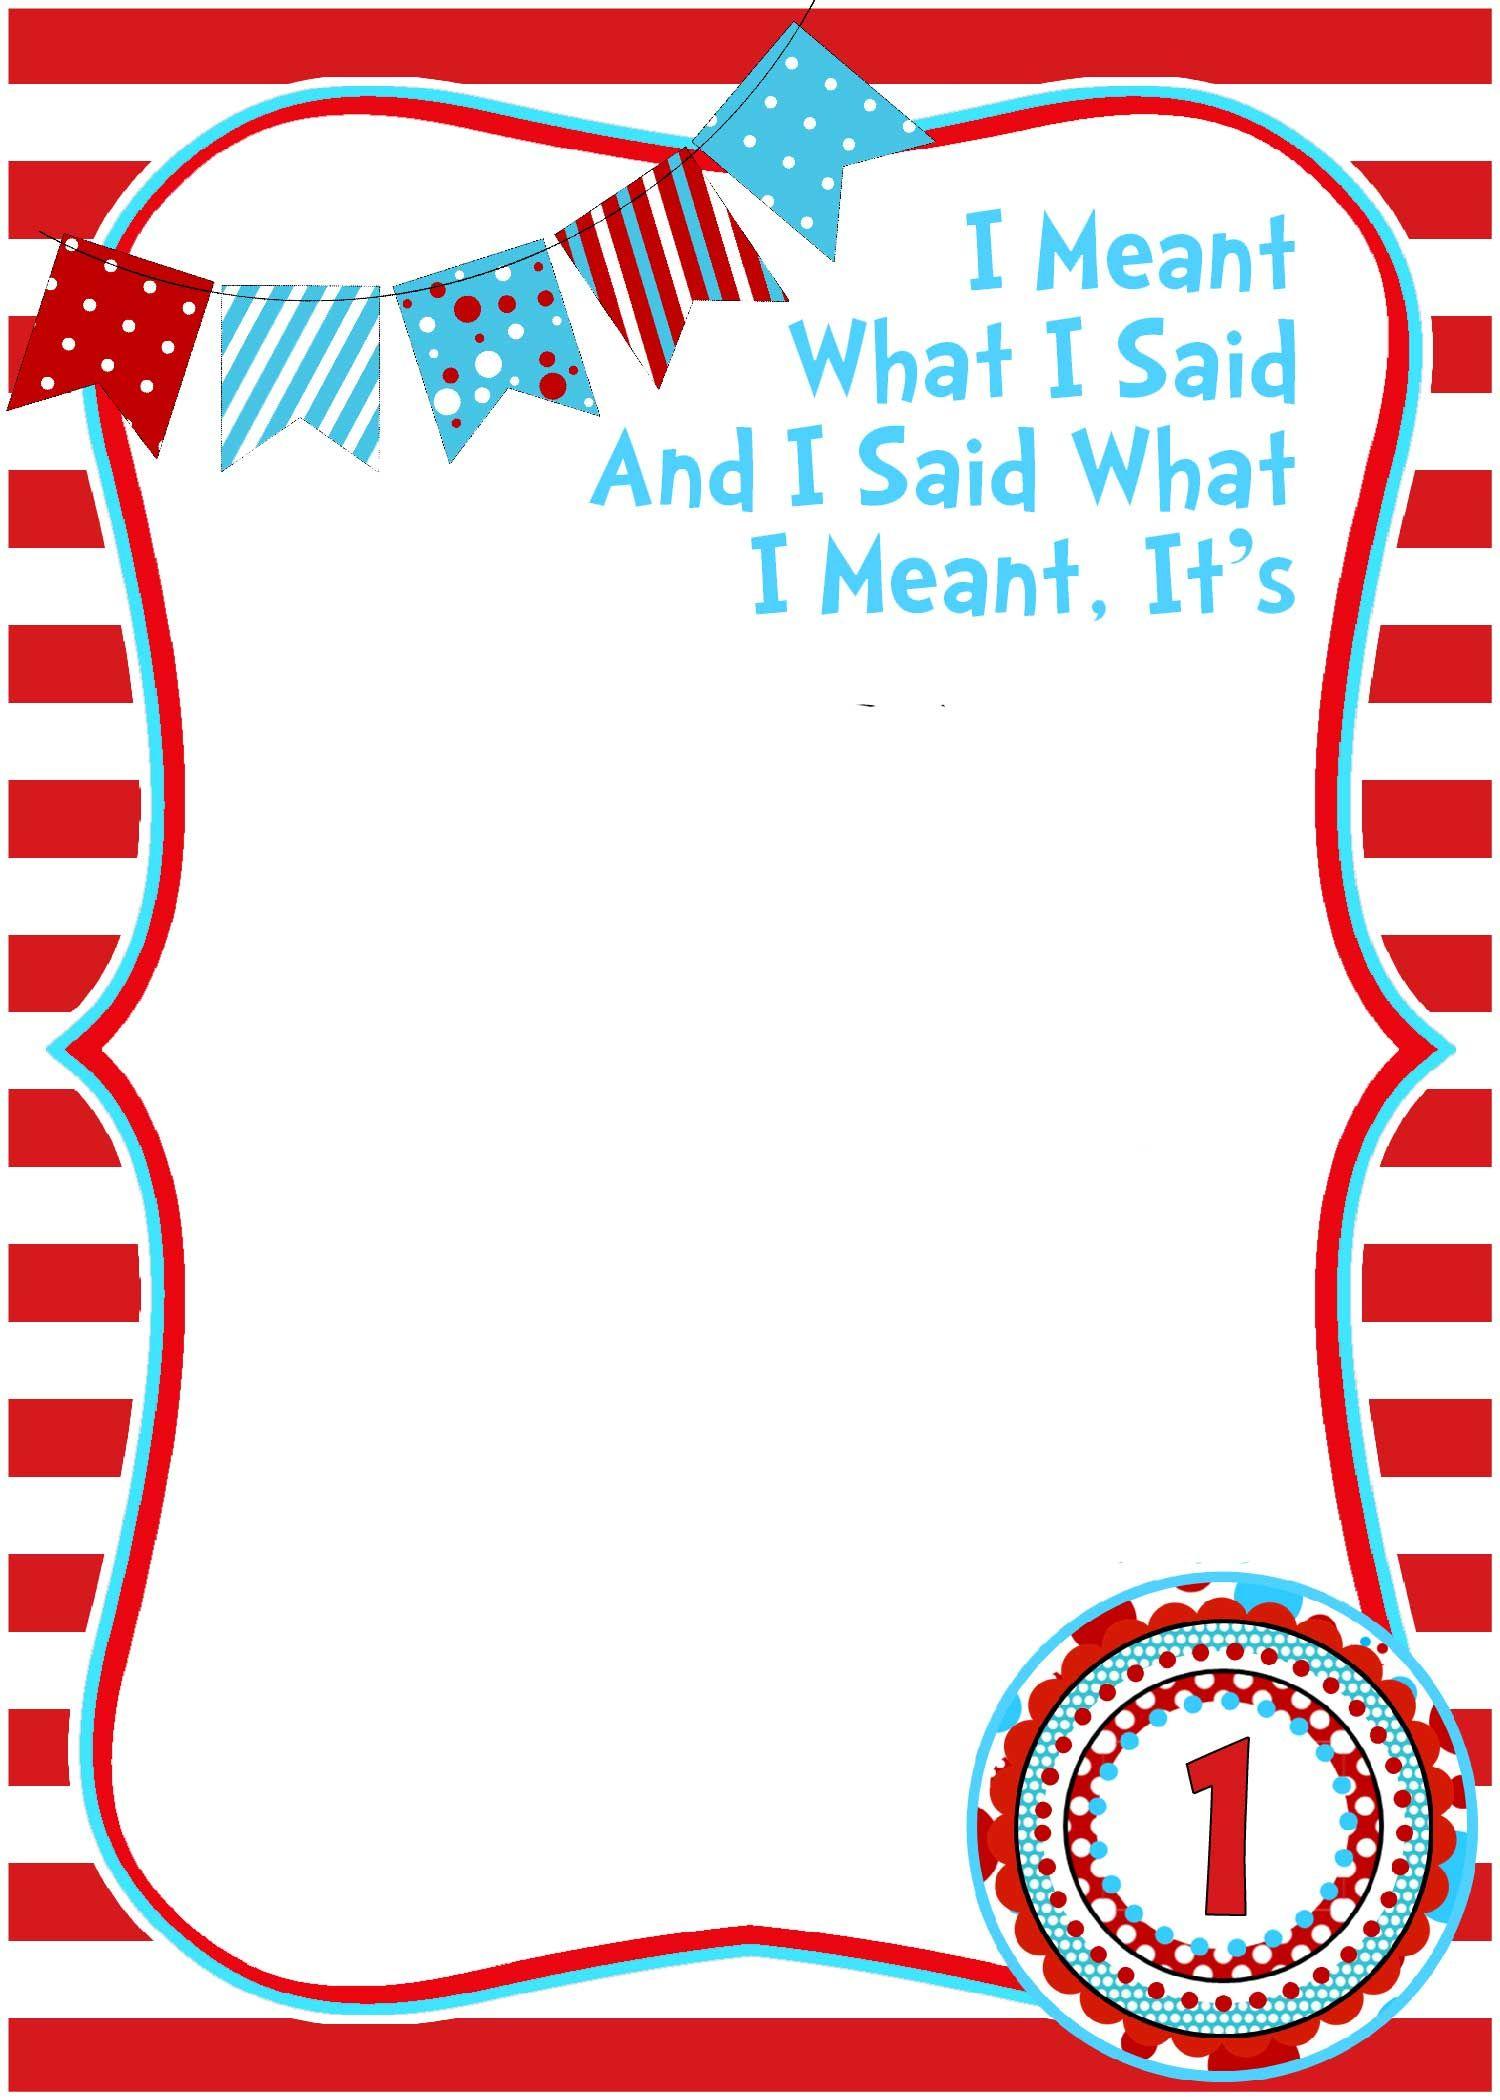 Free Printable Dr Seuss Birthday Invitations In 2021 Printable Birthday Invitations Birthday Card Template Invitation Template